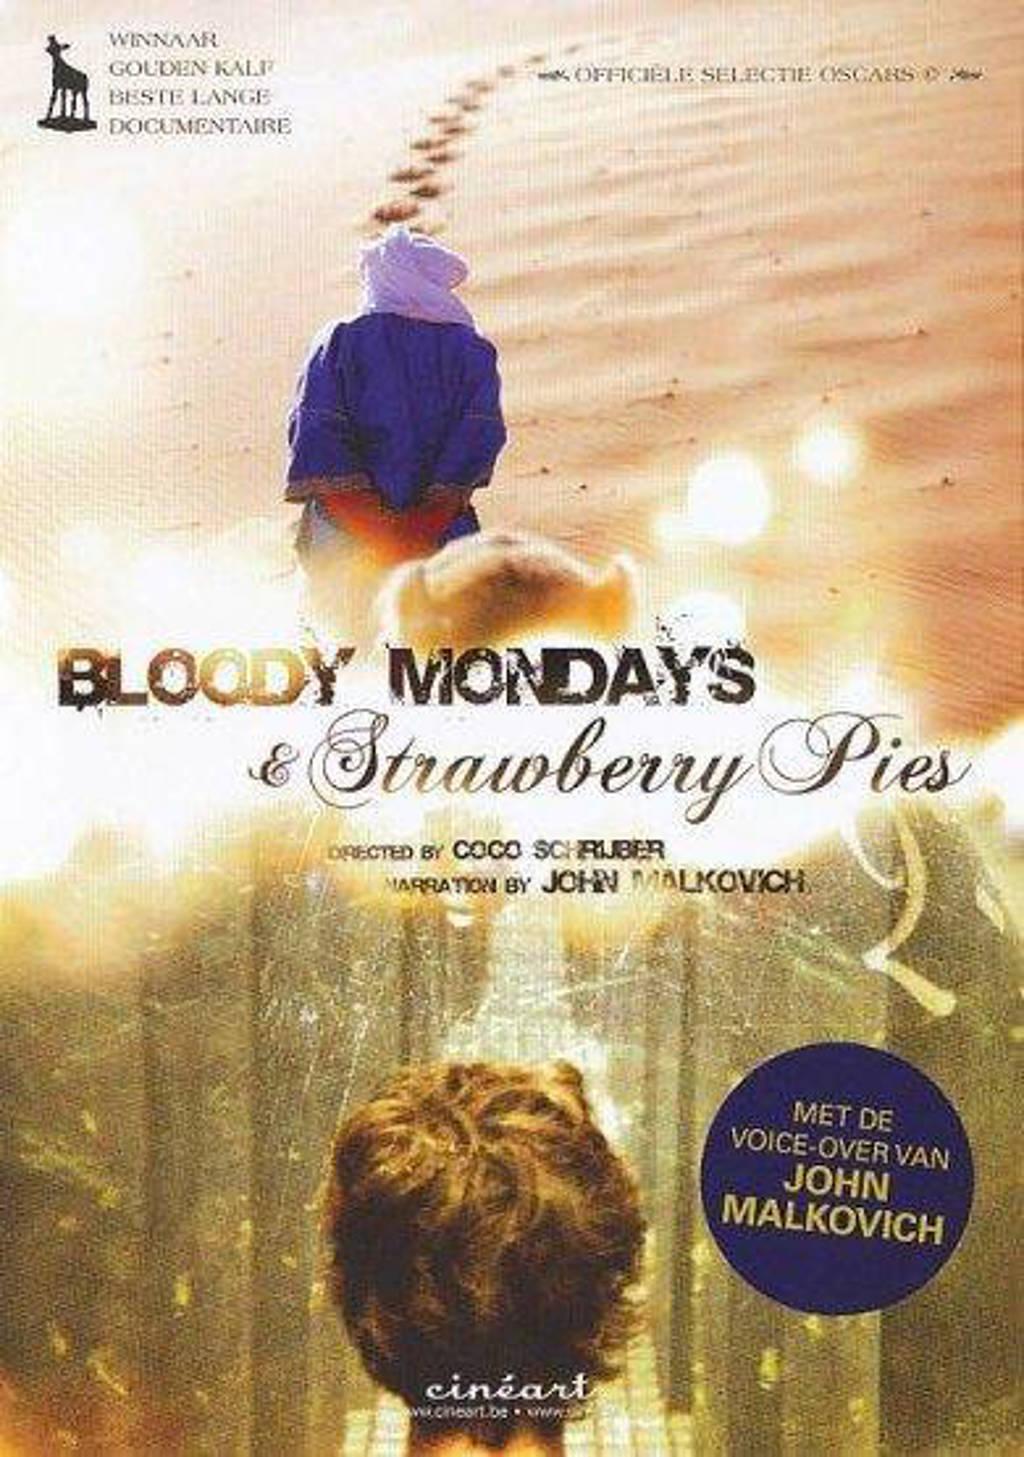 Bloody mondays & strawberry pies (DVD)